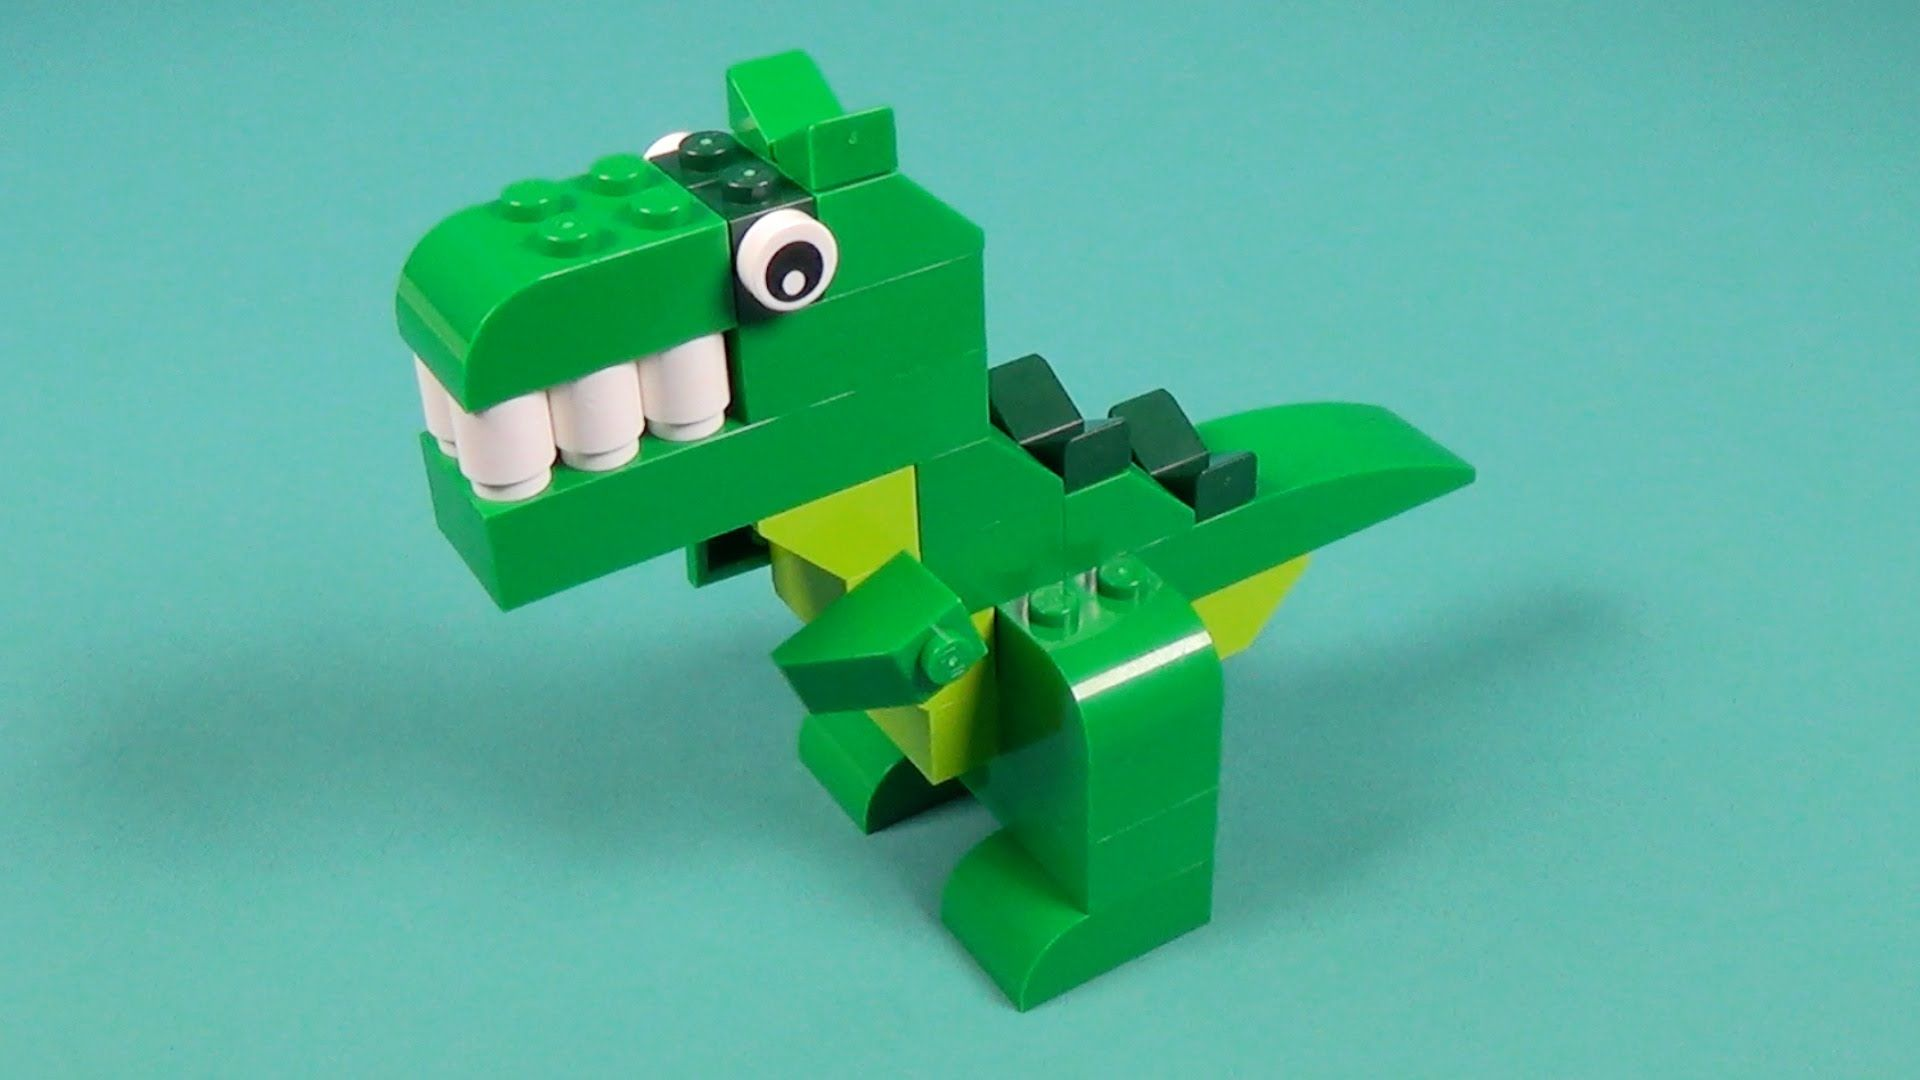 Lego Dino Building Instructions Lego Classic 10693 How To Lego Dino Lego For Kids Lego Dinosaur